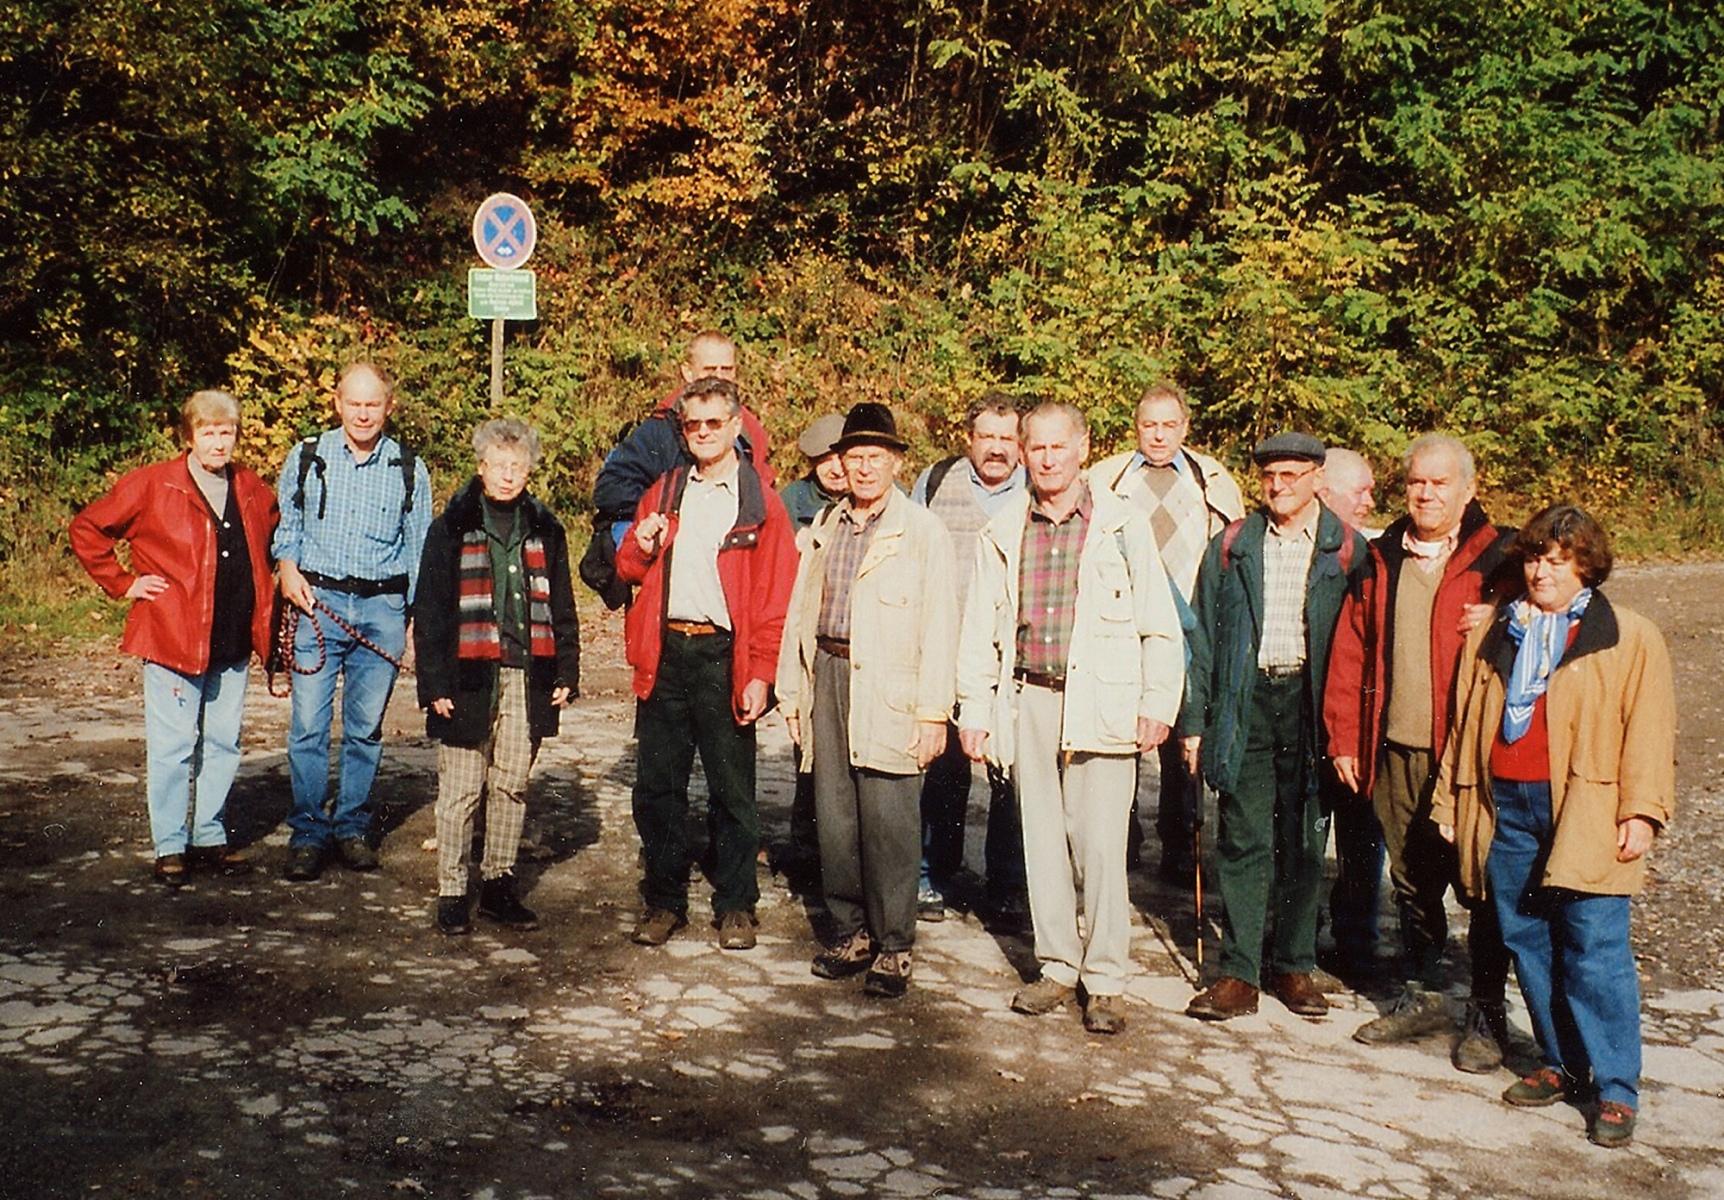 2004_11_03 Bad Wildbad, Herbstwanderung